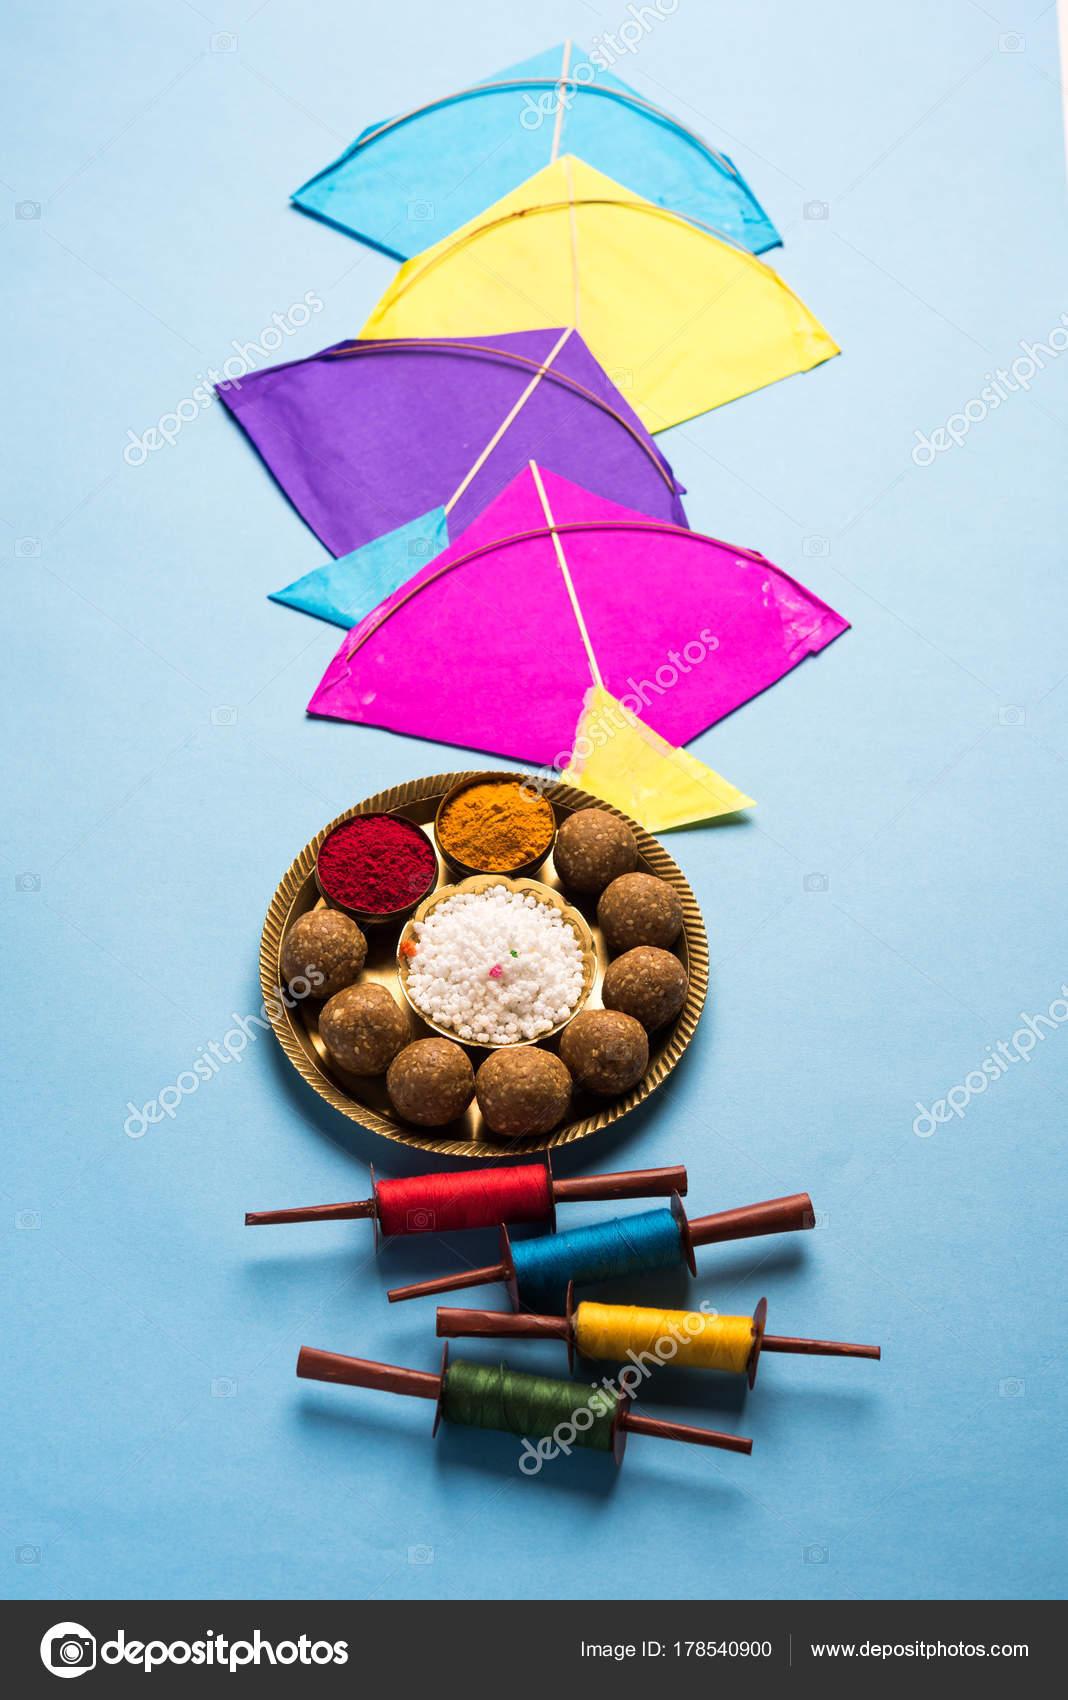 Happy makar sankranti greeting card tilgul til ladoo bowl plate happy makar sankranti greeting card tilgul or til ladoo in a bowl or plate with haldi kumkum and flowers with fikri reelchakri spool with colourful m4hsunfo